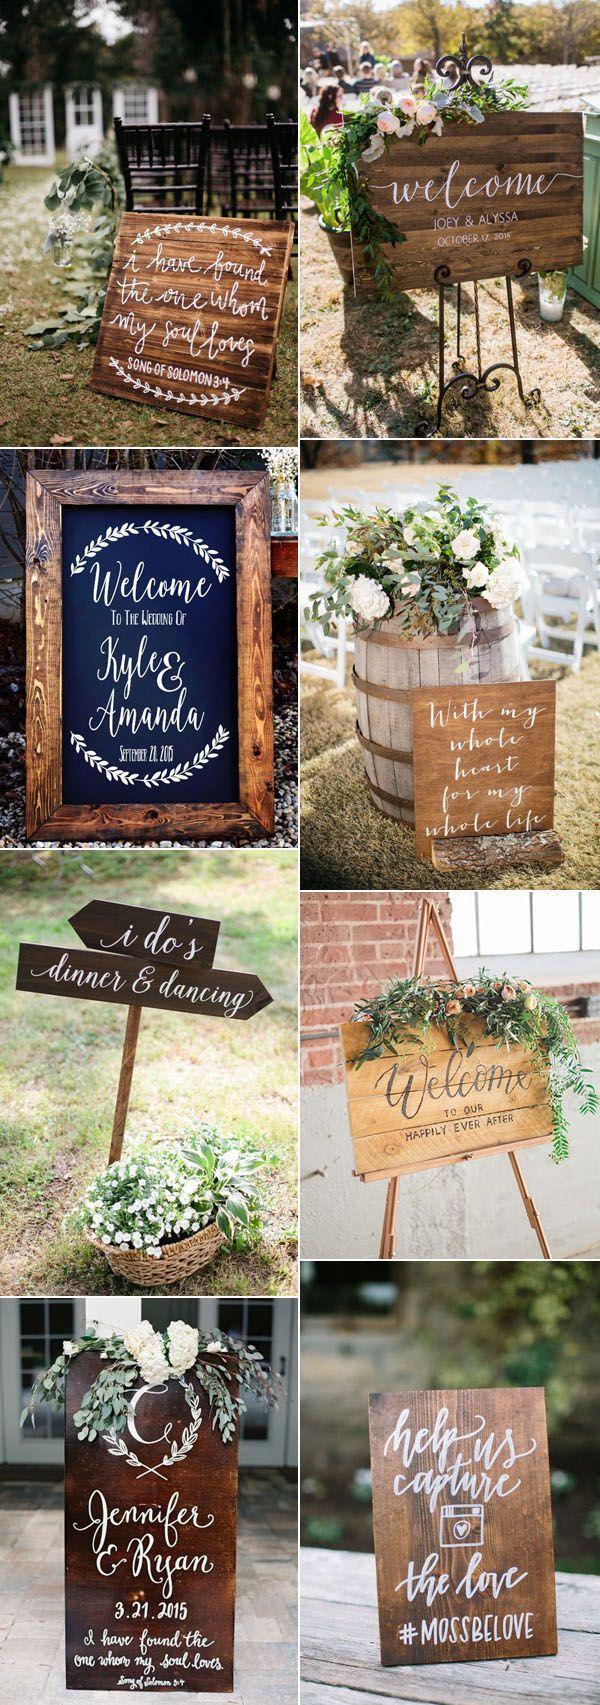 Viking wedding decorations october 2018  best I Do Color Themes images on Pinterest  Wedding ideas